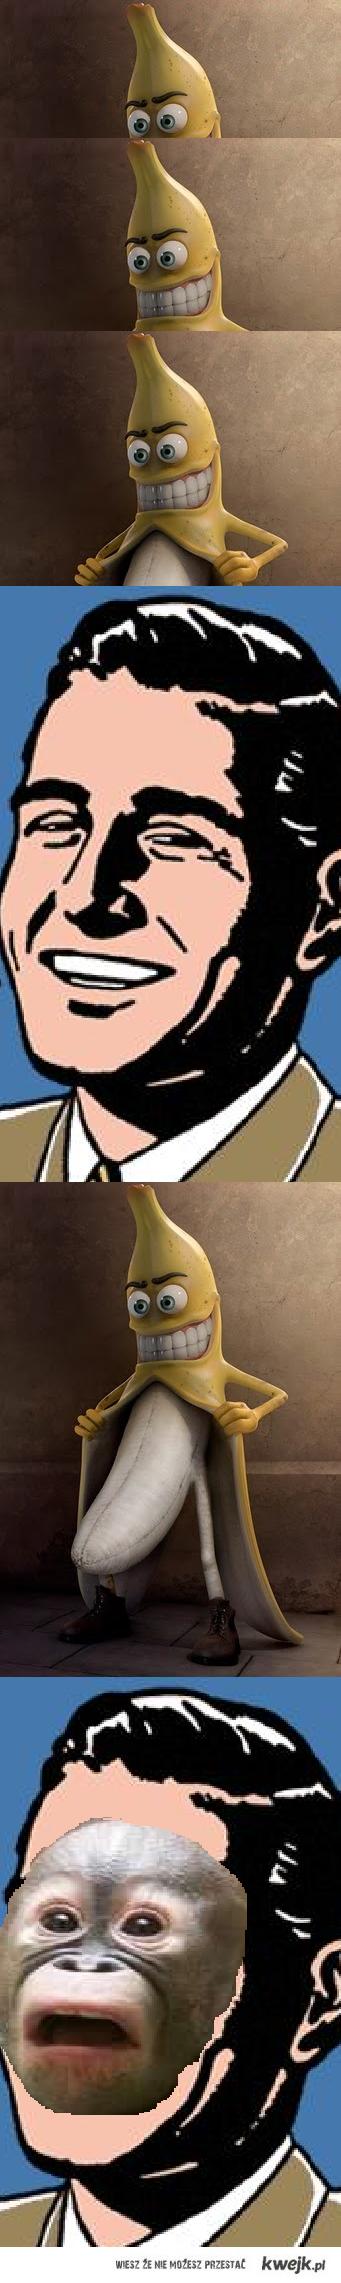 Cwany Banan